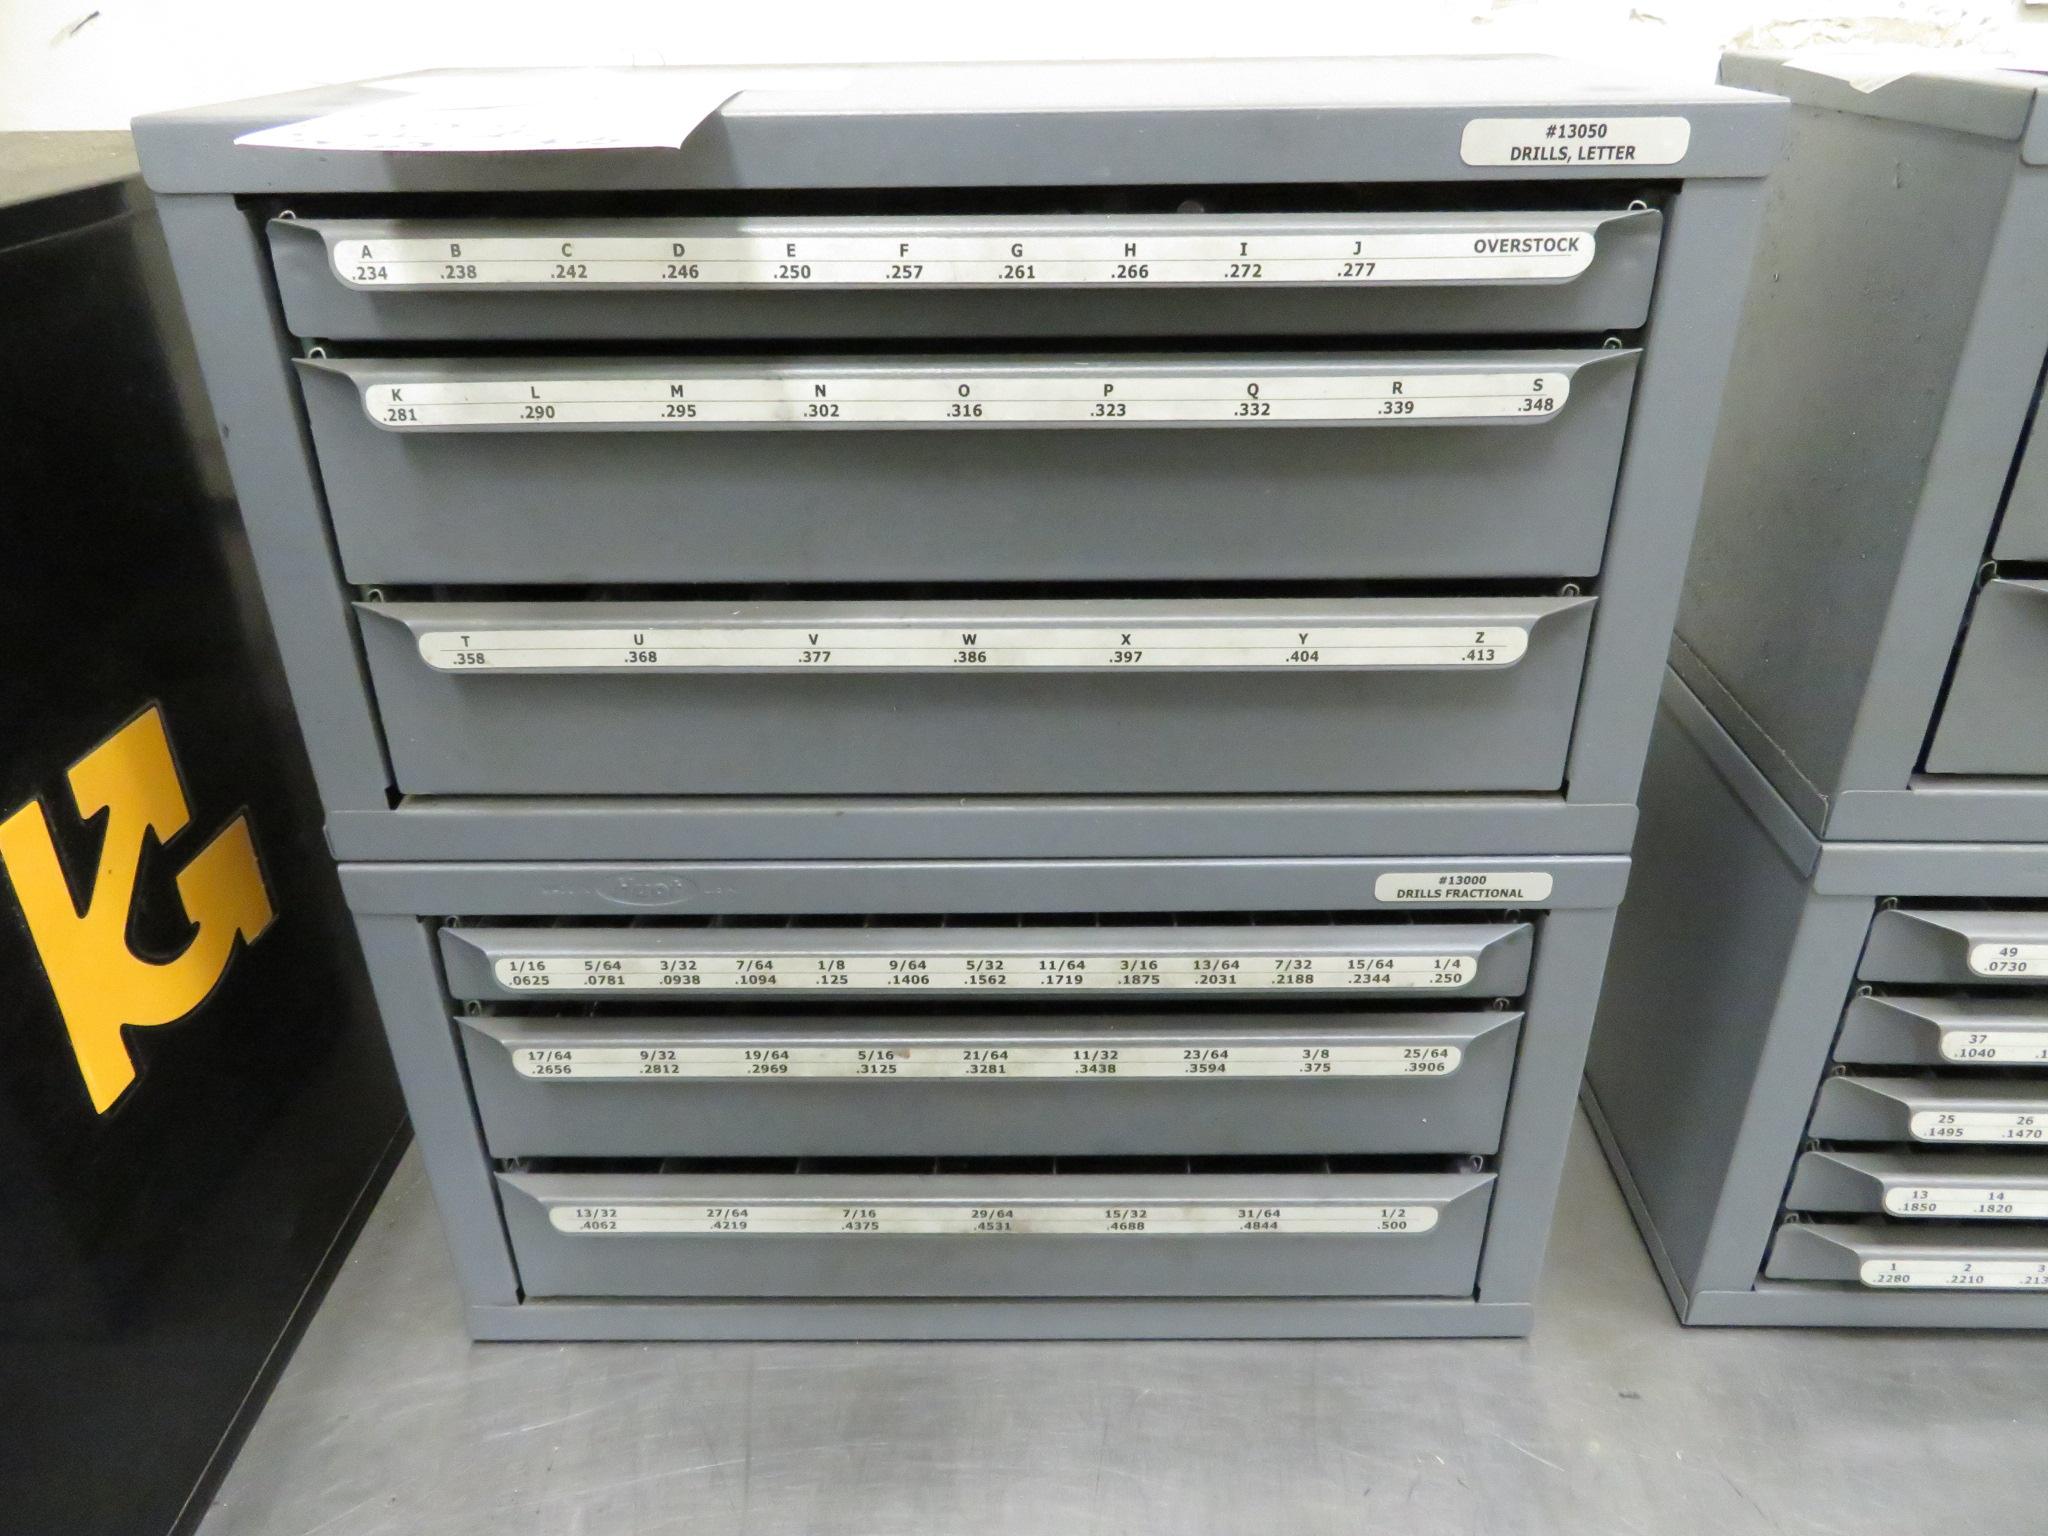 (Lot) (2) Drill Cabinets w/ Drill Bits - Image 2 of 2